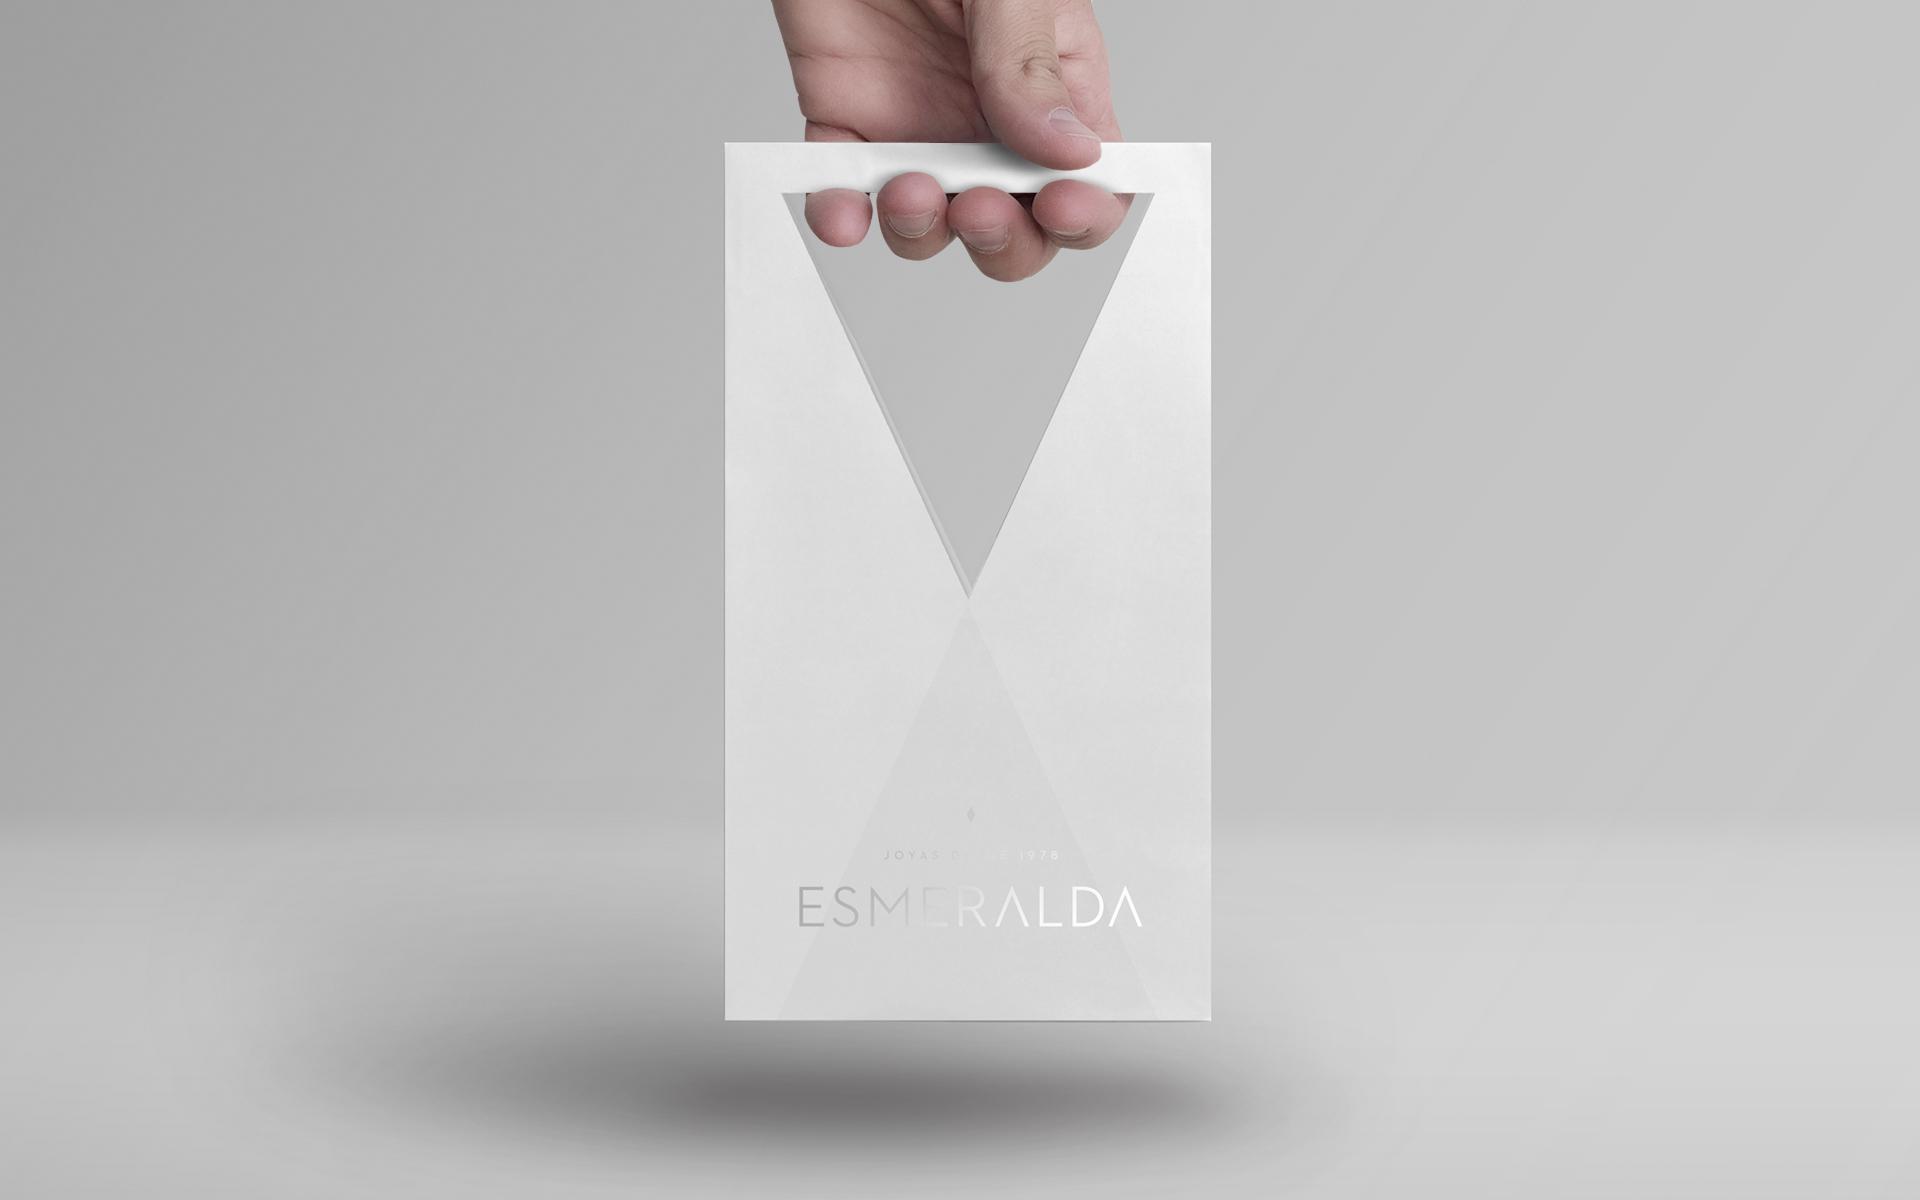 esmeralda-bolsa.jpg